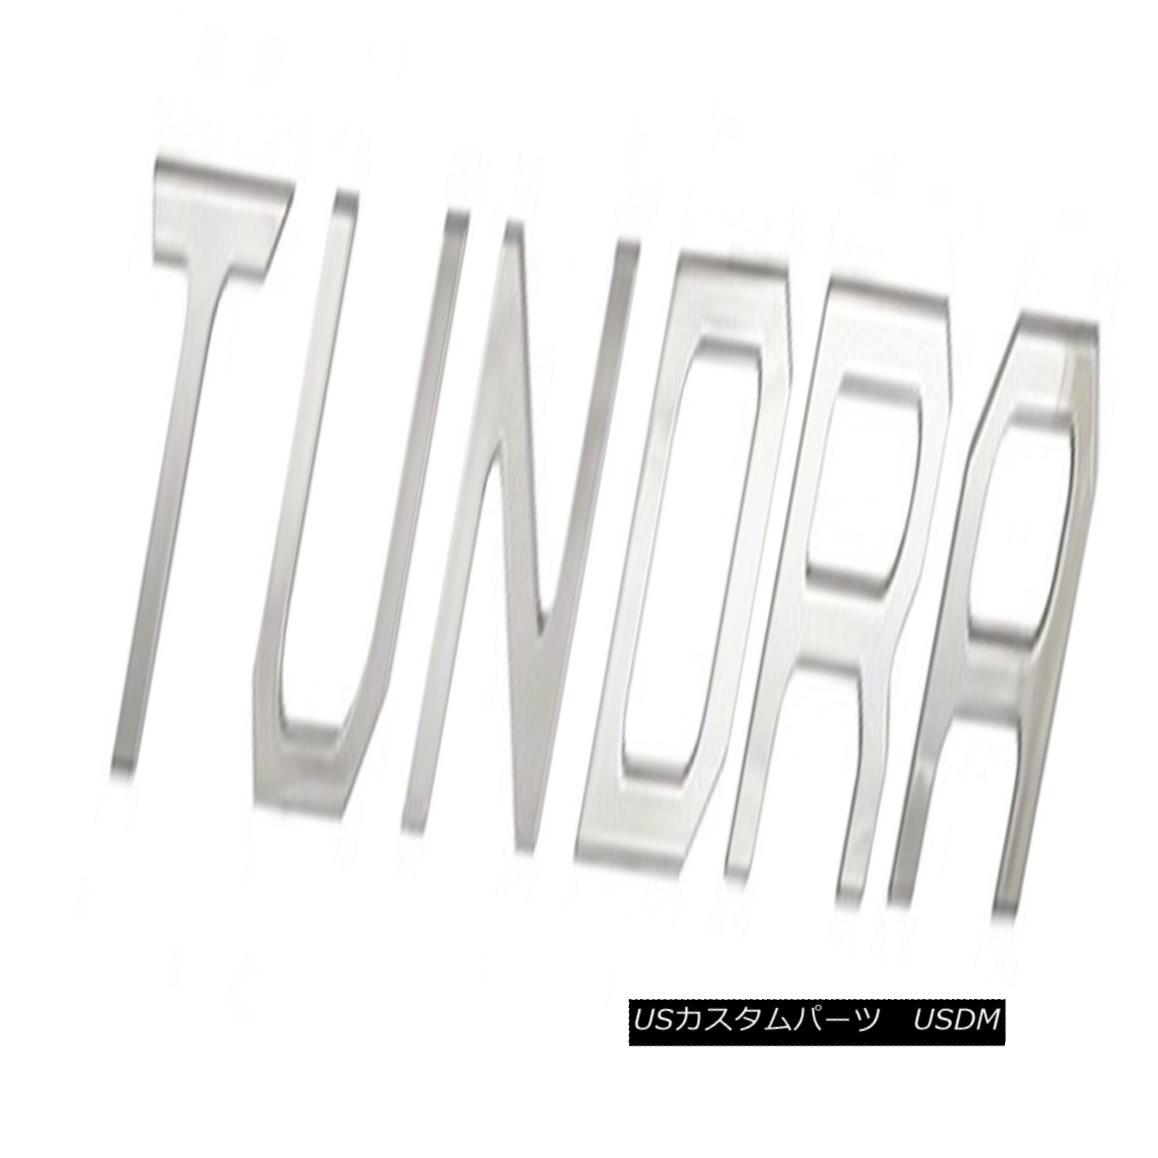 USグリル Fits 2014-15 Tundra Chrome Accent Letters (T-U-N-D-R-A) CCITUNDRA01S 2014-15 Tundra Chromeアクセントレター(T-U-N-D-R-A)CCITUNDRA01Sに適合